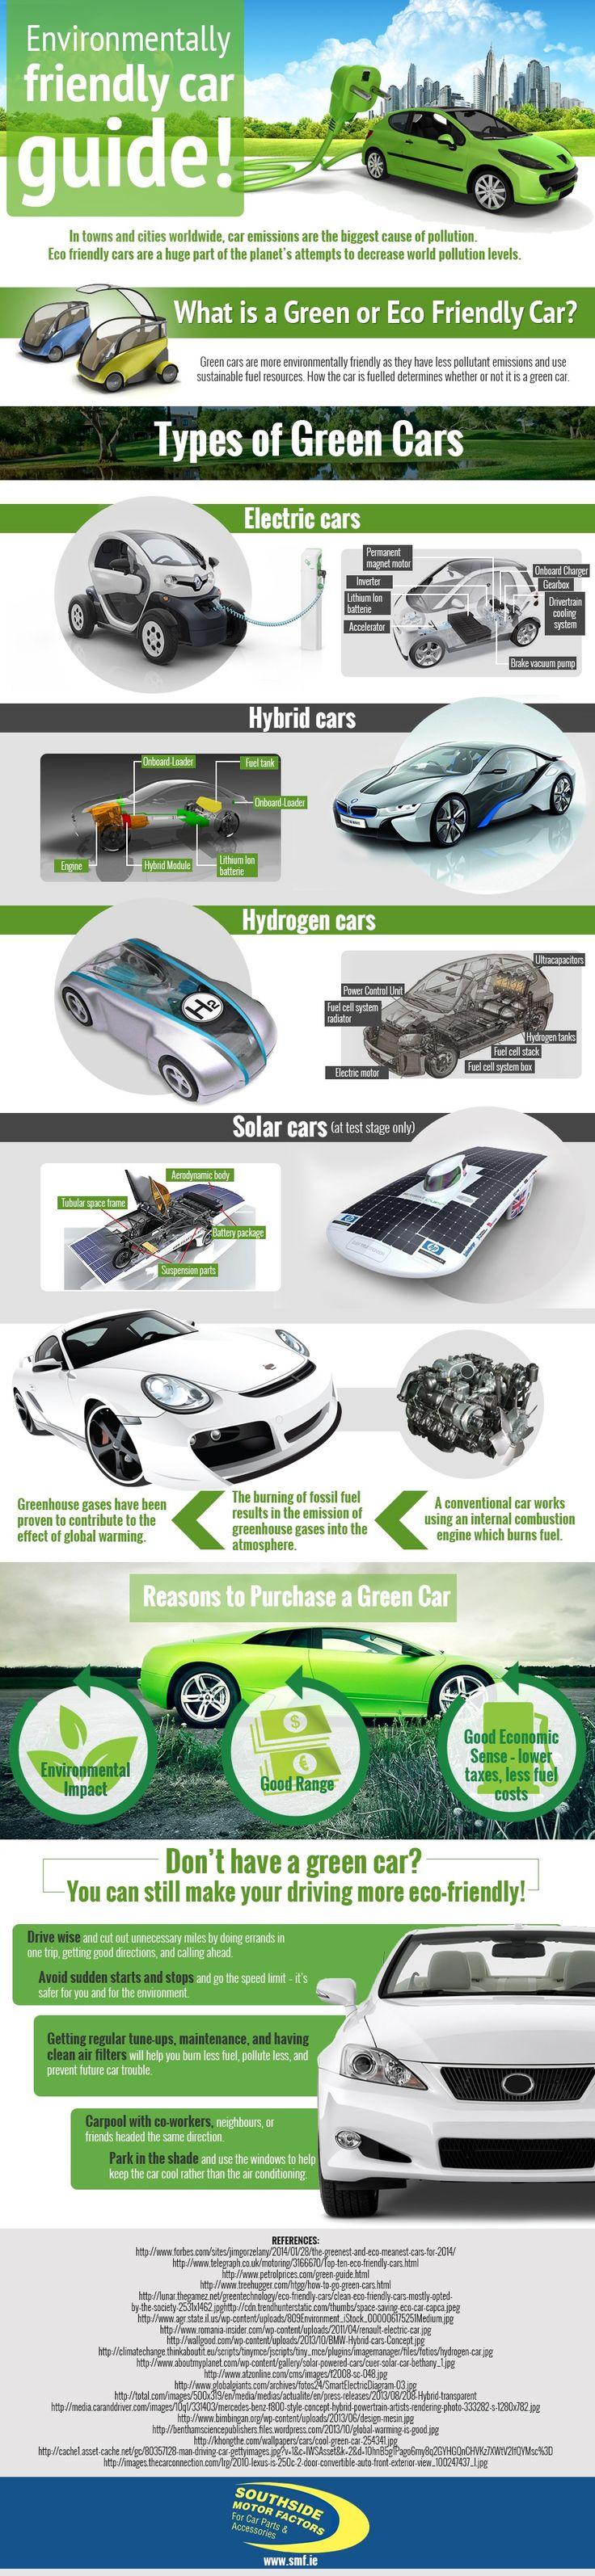 Environmentally Friendly Car Guide